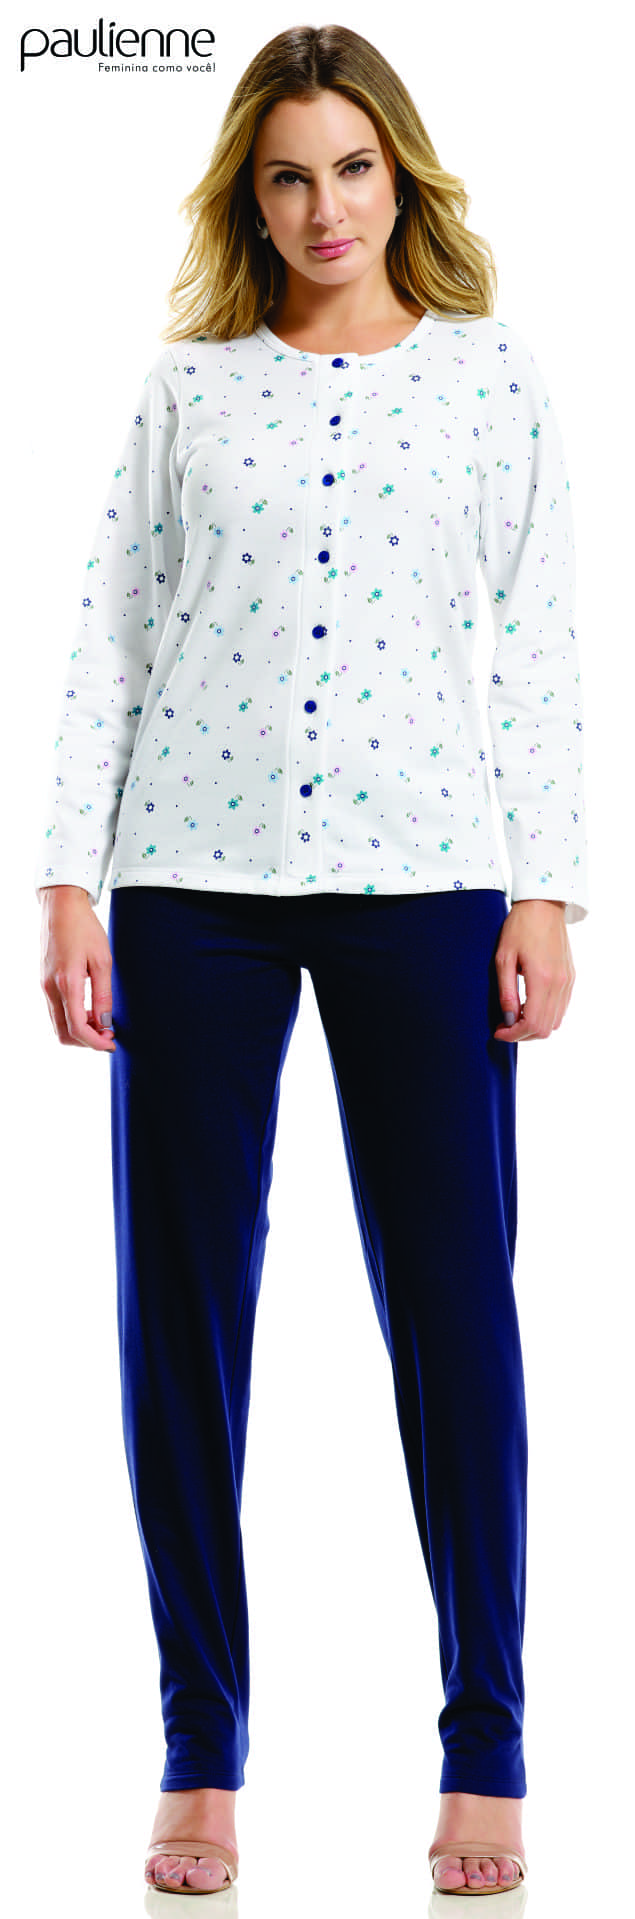 Pijama Feminino Adulto Longo Paulienne Aberto Flanelado Estampado A90 23062